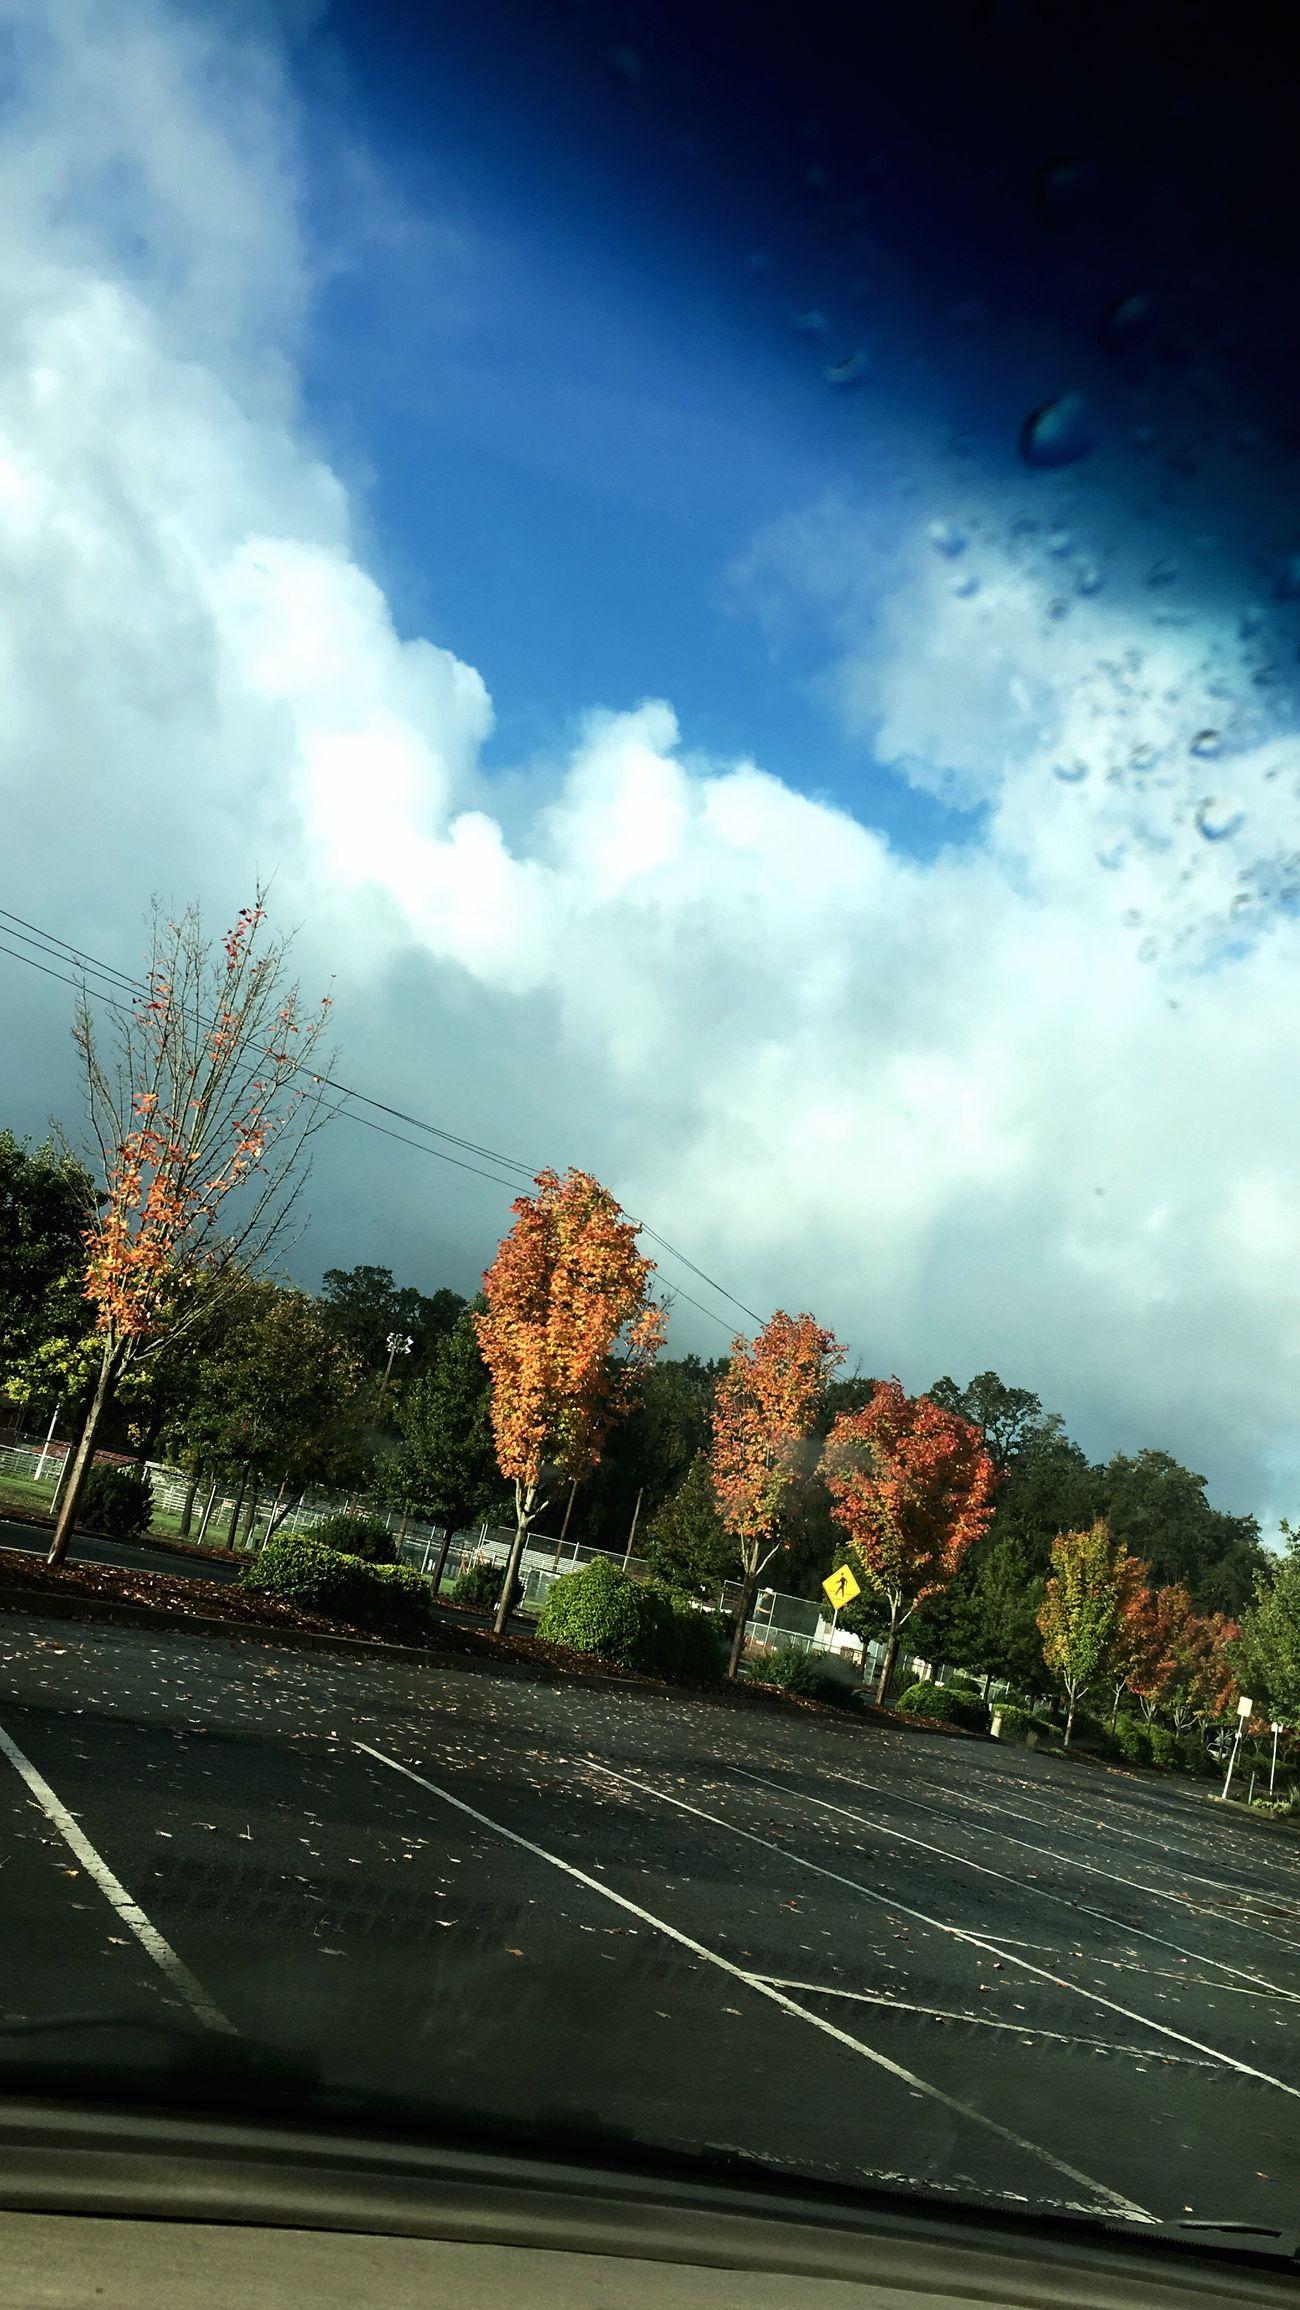 Cloudy Sky Rain Trees Leafes First Eyeem Photo